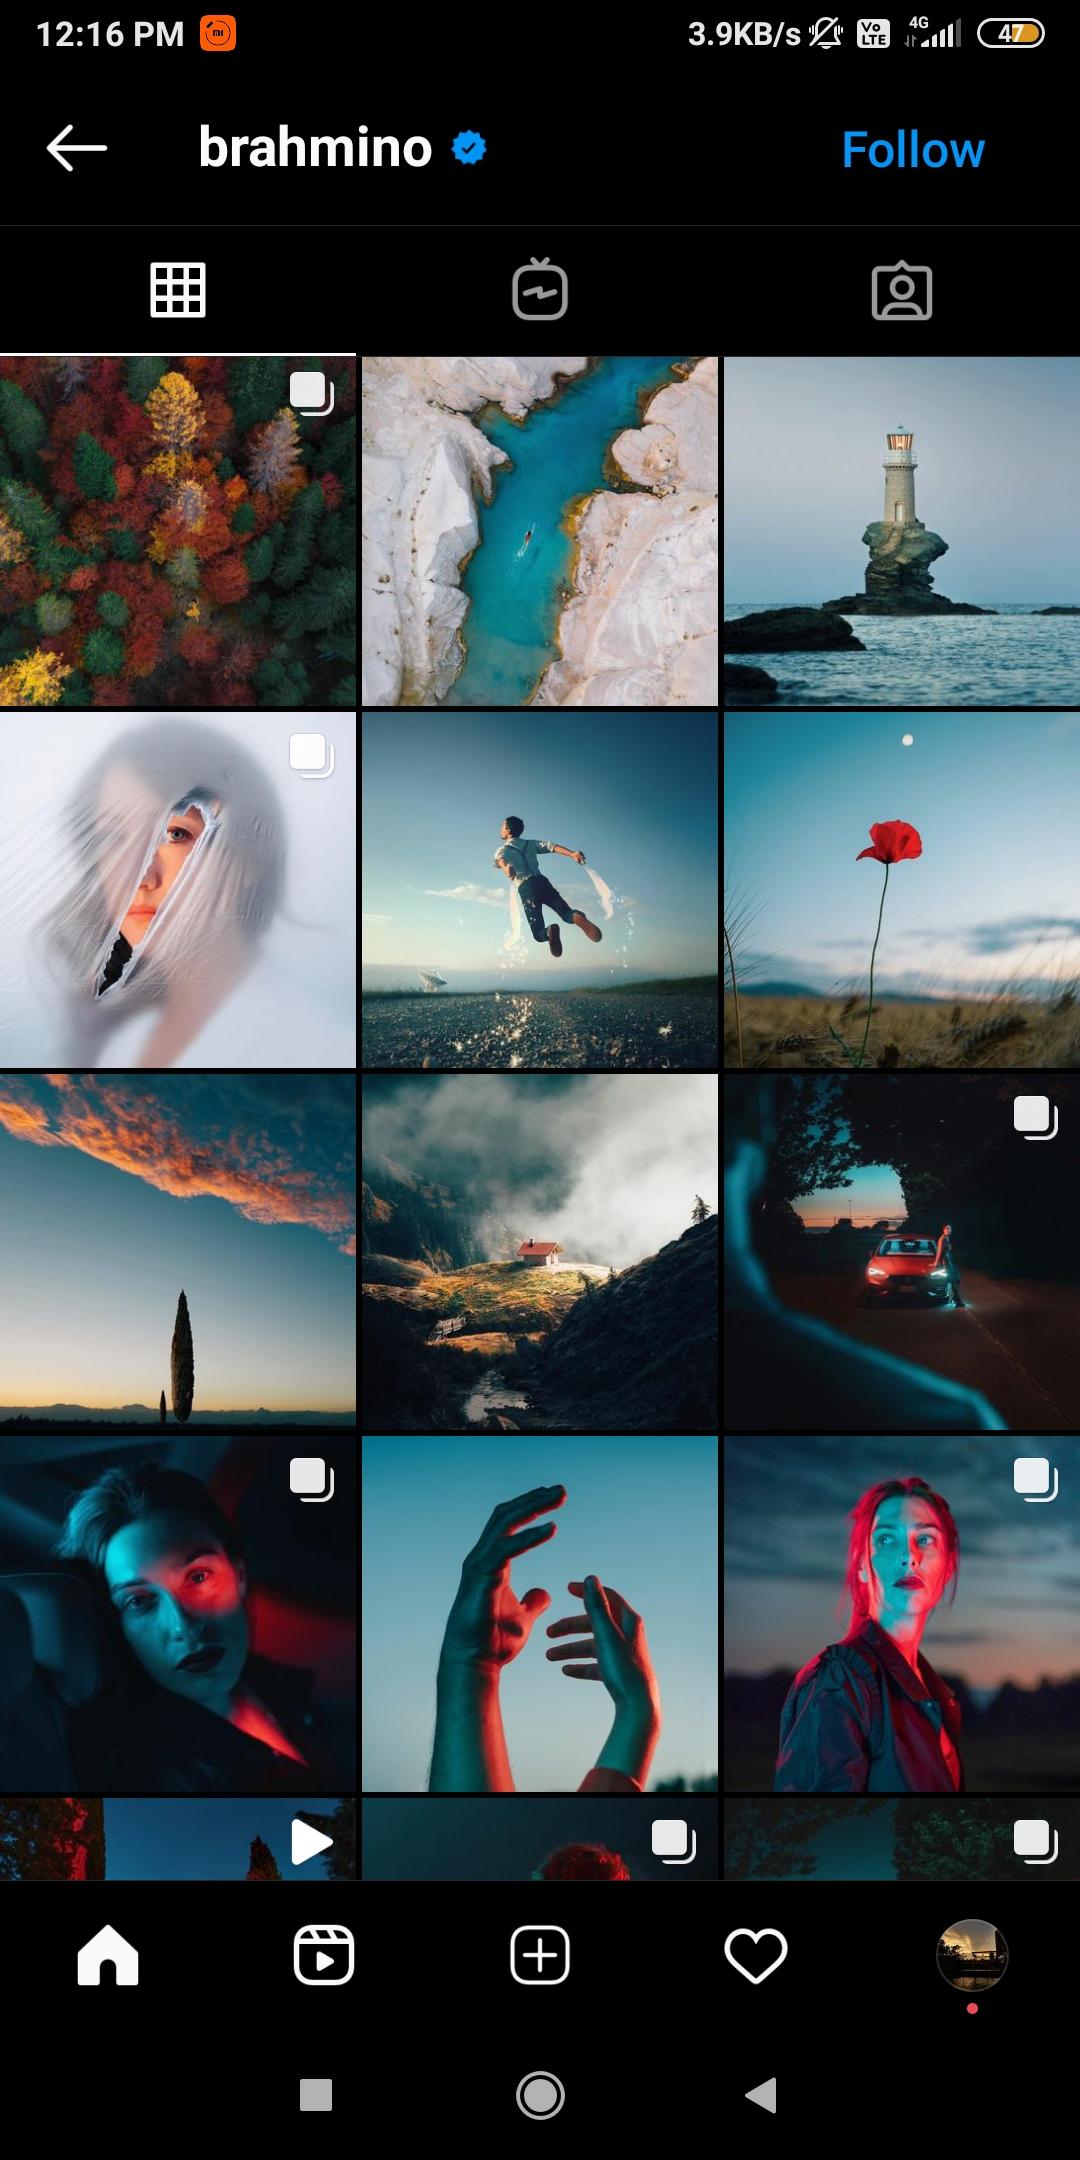 @brahmino  -  brahmino - 43 Best PHOTOGRAPHY Instagram Accounts  – PHOTOGRAPHERS to Follow Right Now